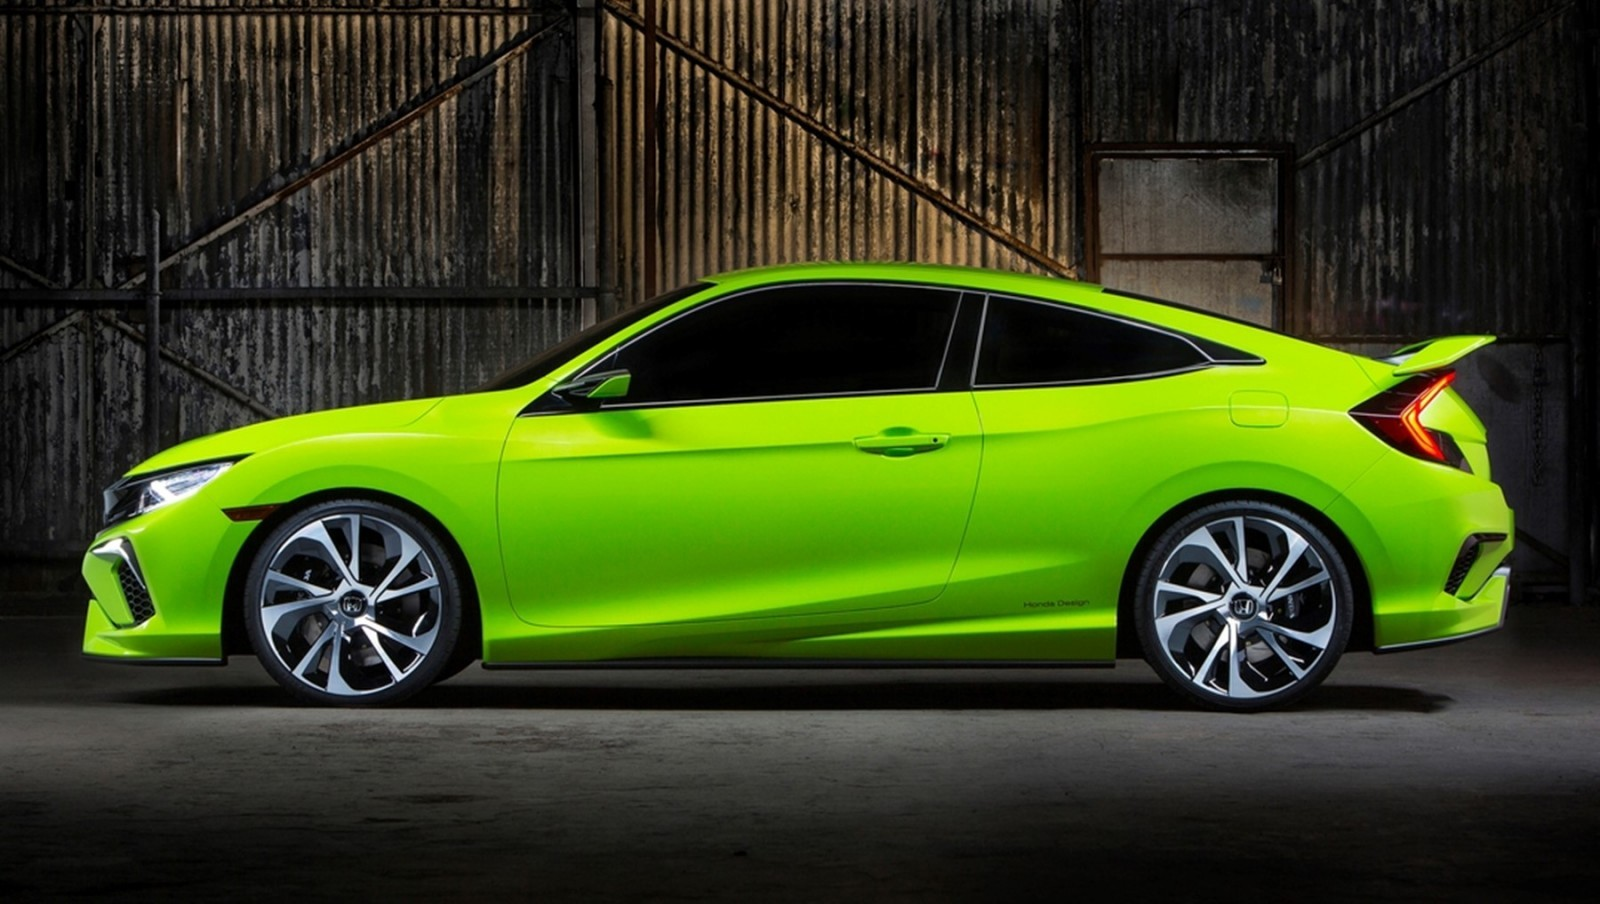 Gen 10 honda civic coupe concept car revs for Future honda cars